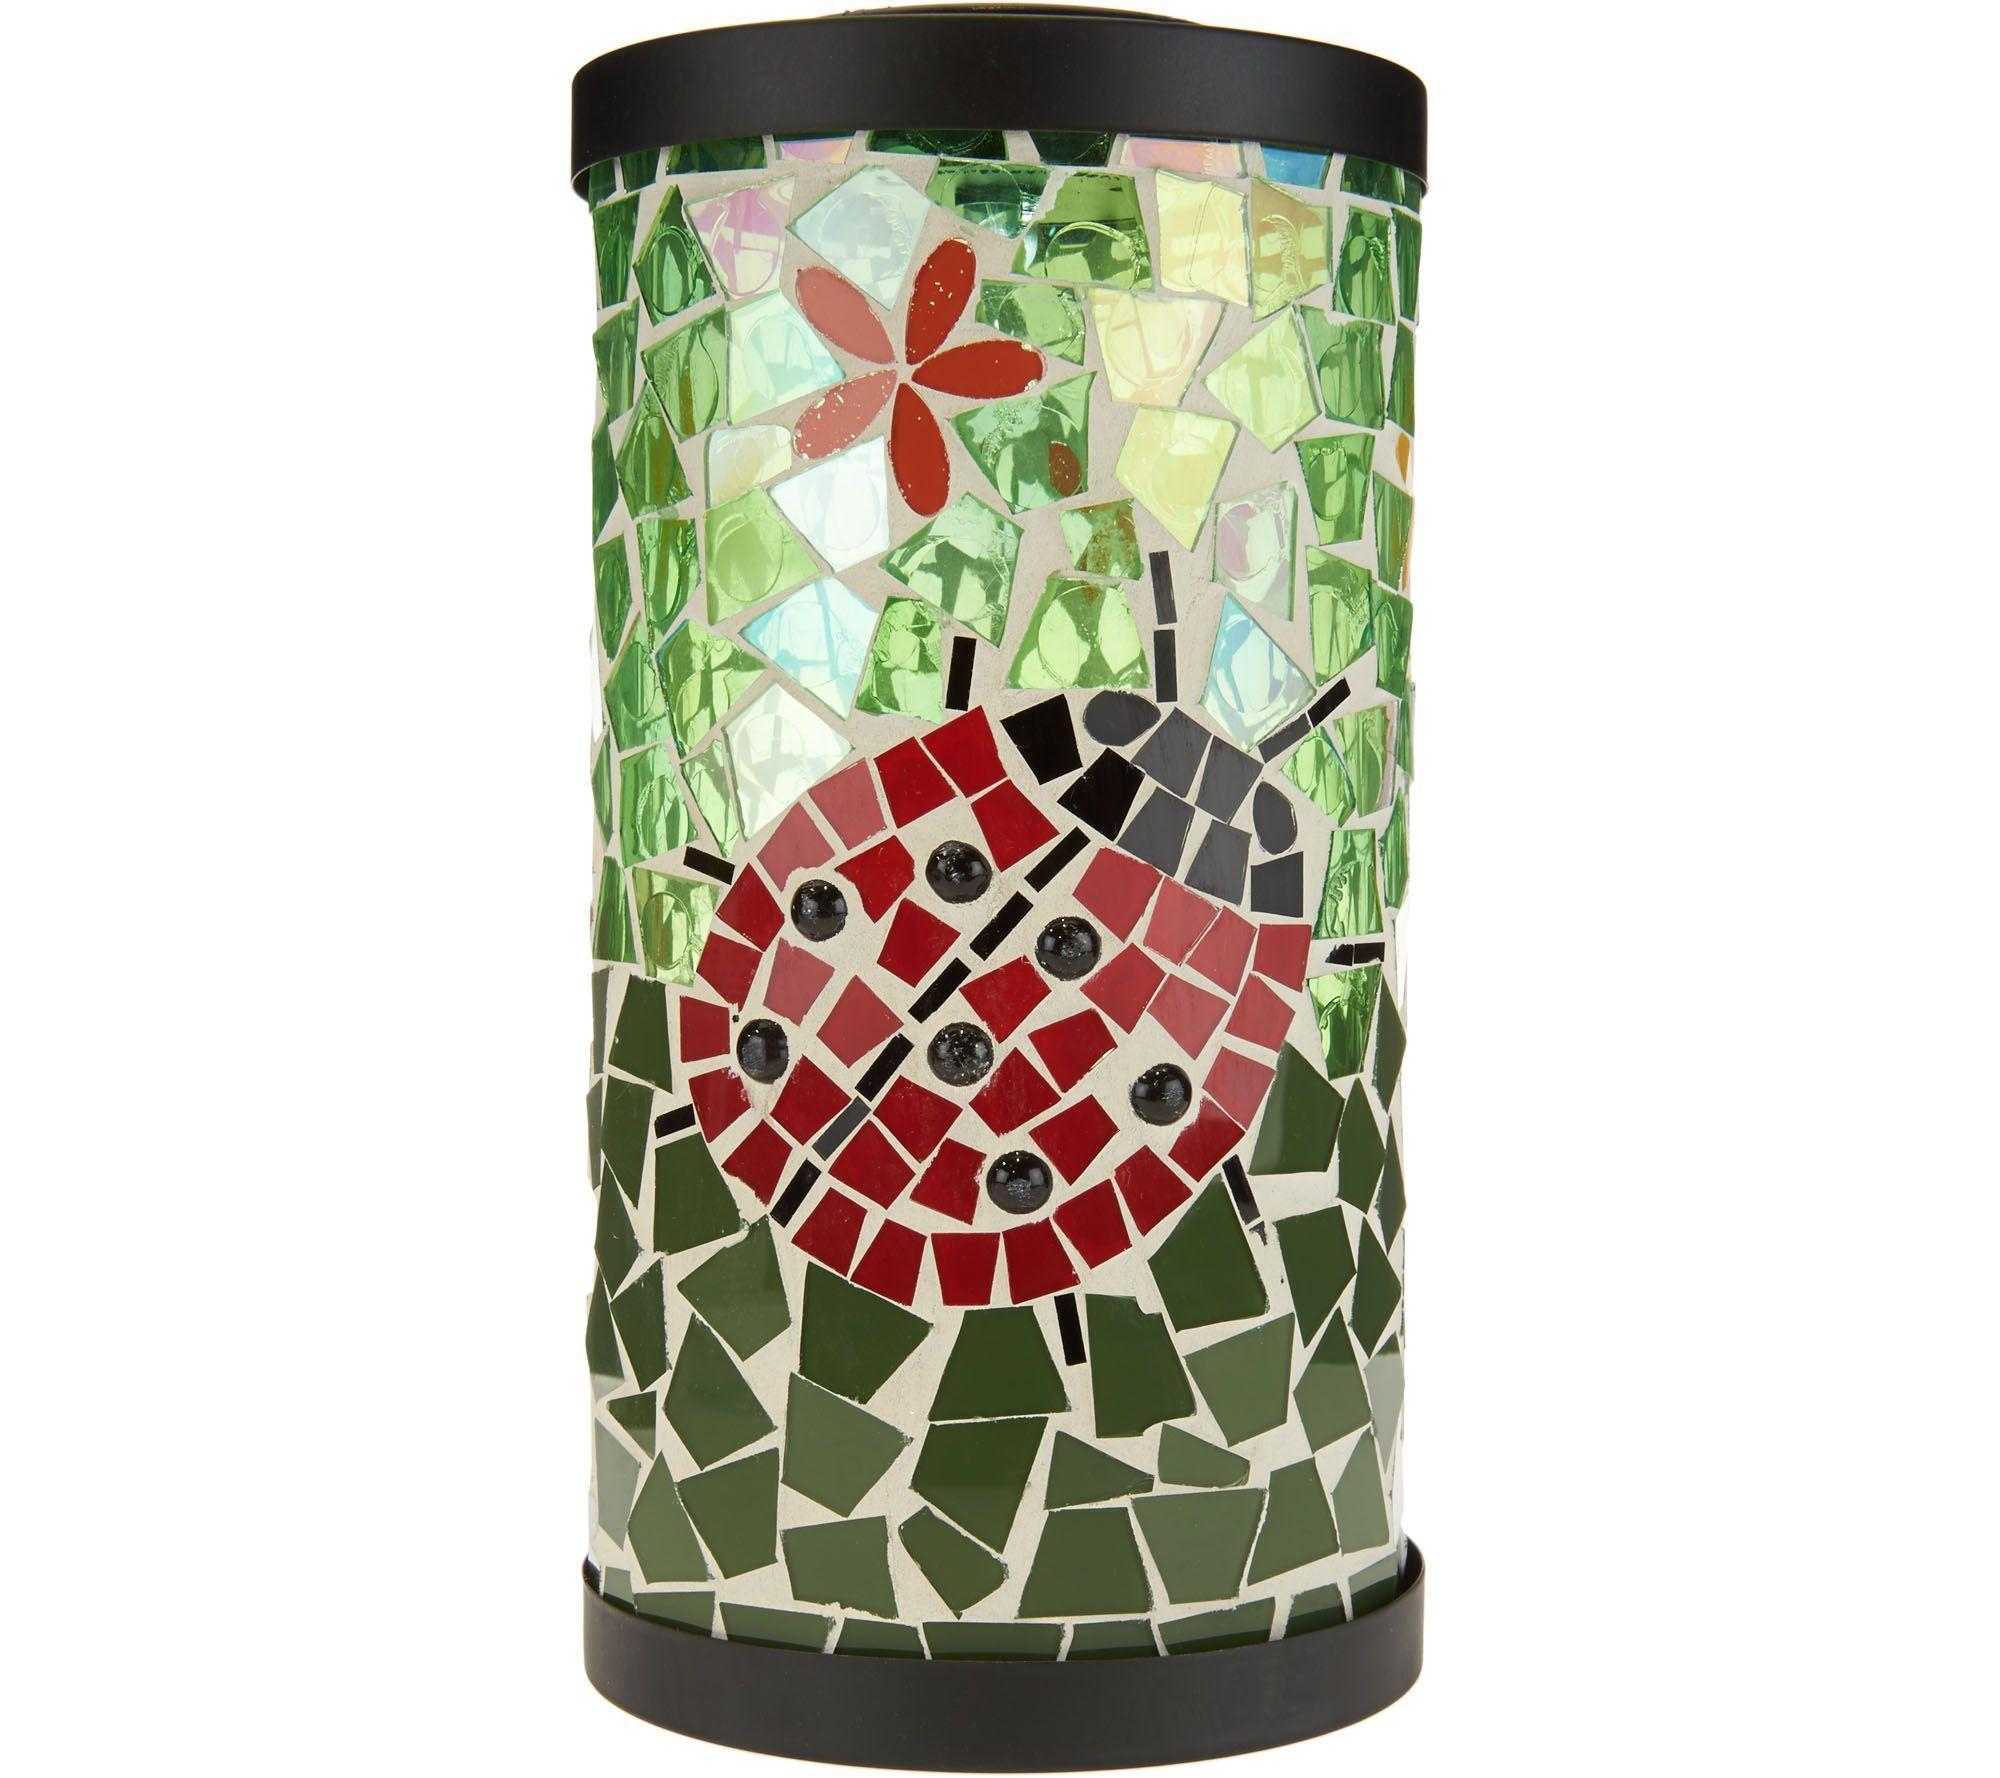 Cottage lighthouse lamp 3 colors - Plow Hearth Solar Mosaic Glass Lantern M52141